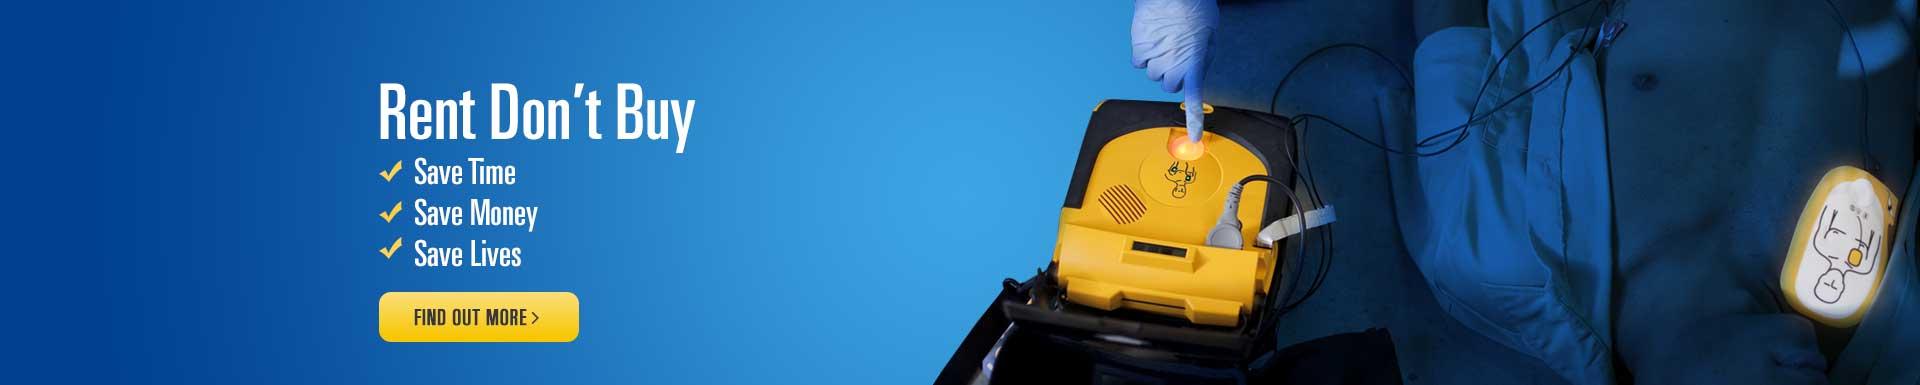 Defibrillator Rental